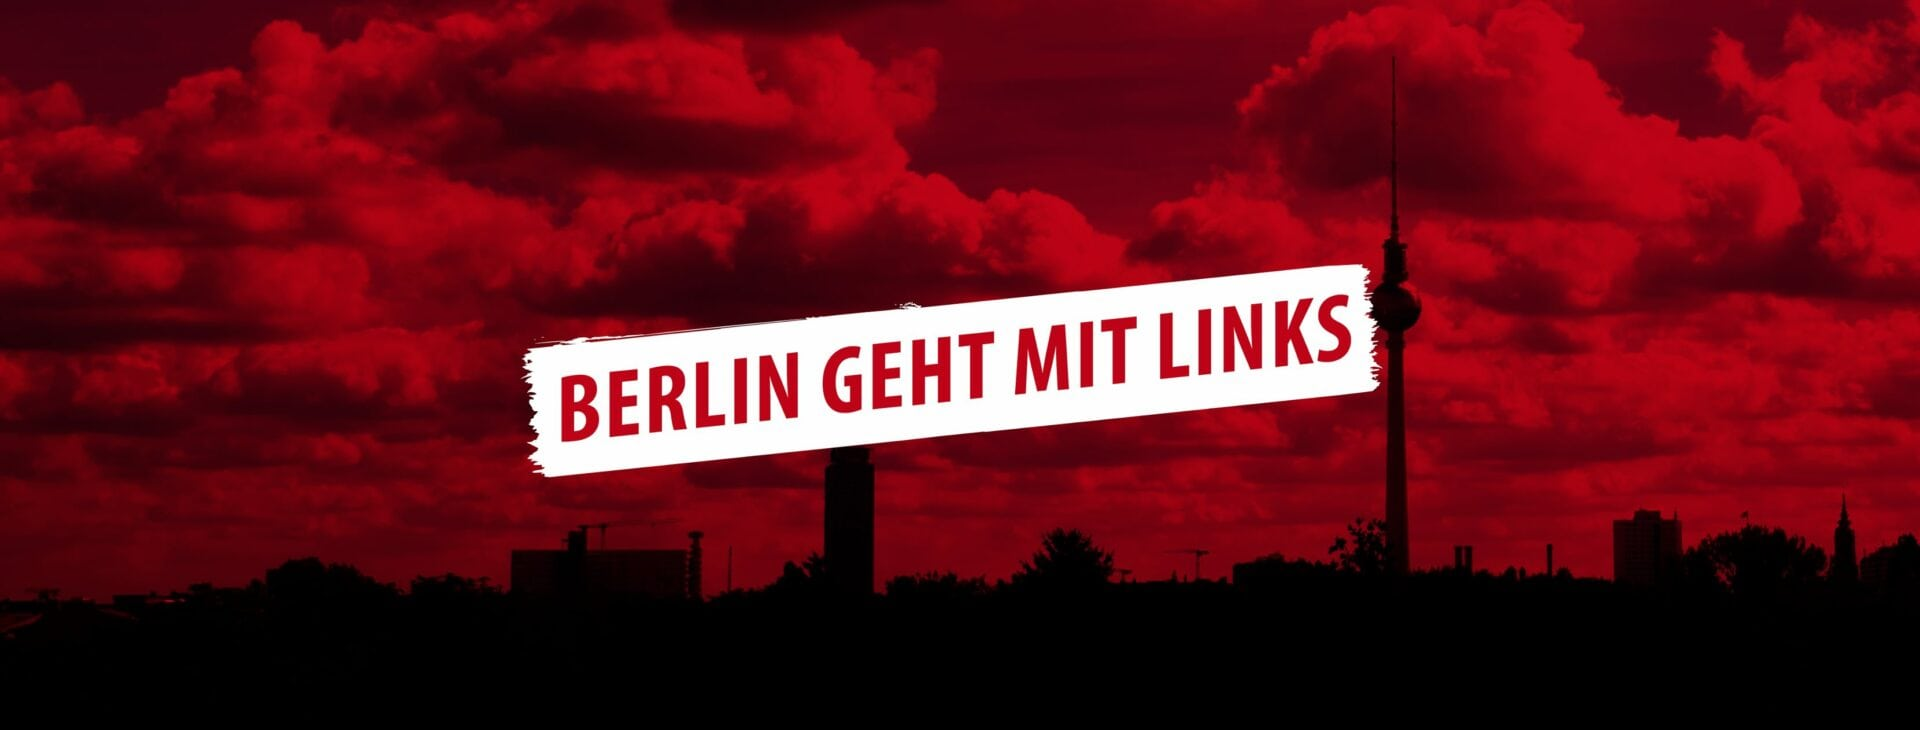 Berlin geht mit links